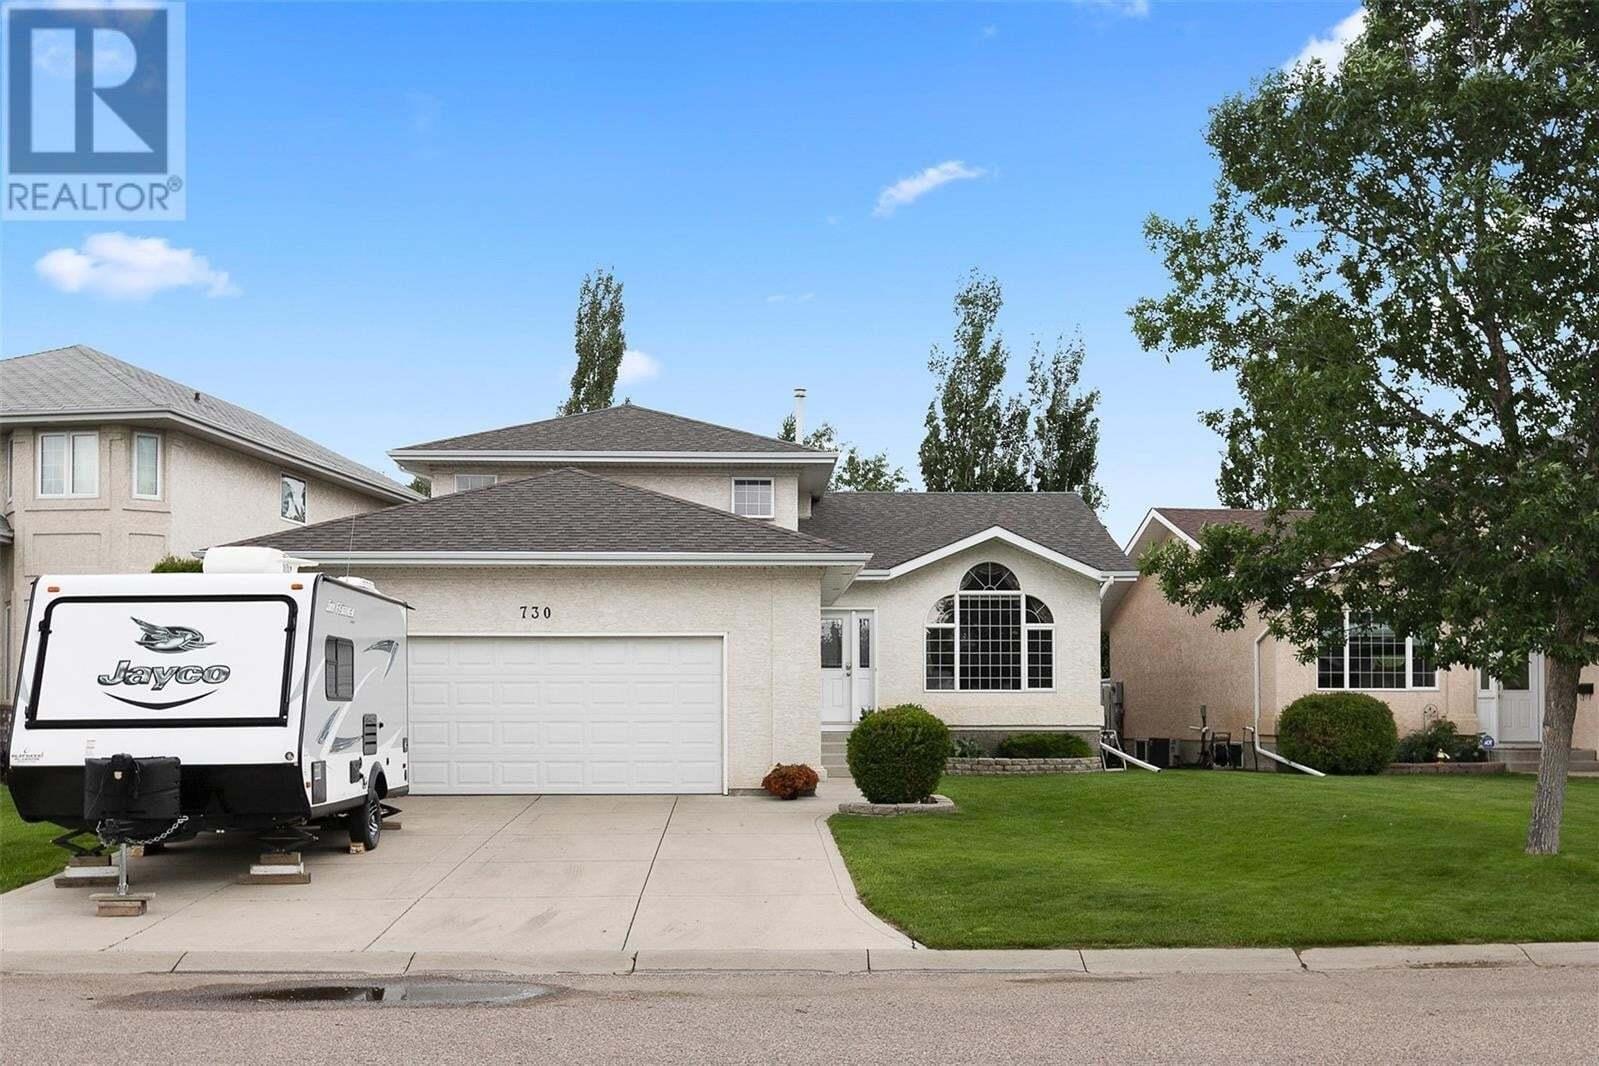 House for sale at 730 Chotem Cres Saskatoon Saskatchewan - MLS: SK817298